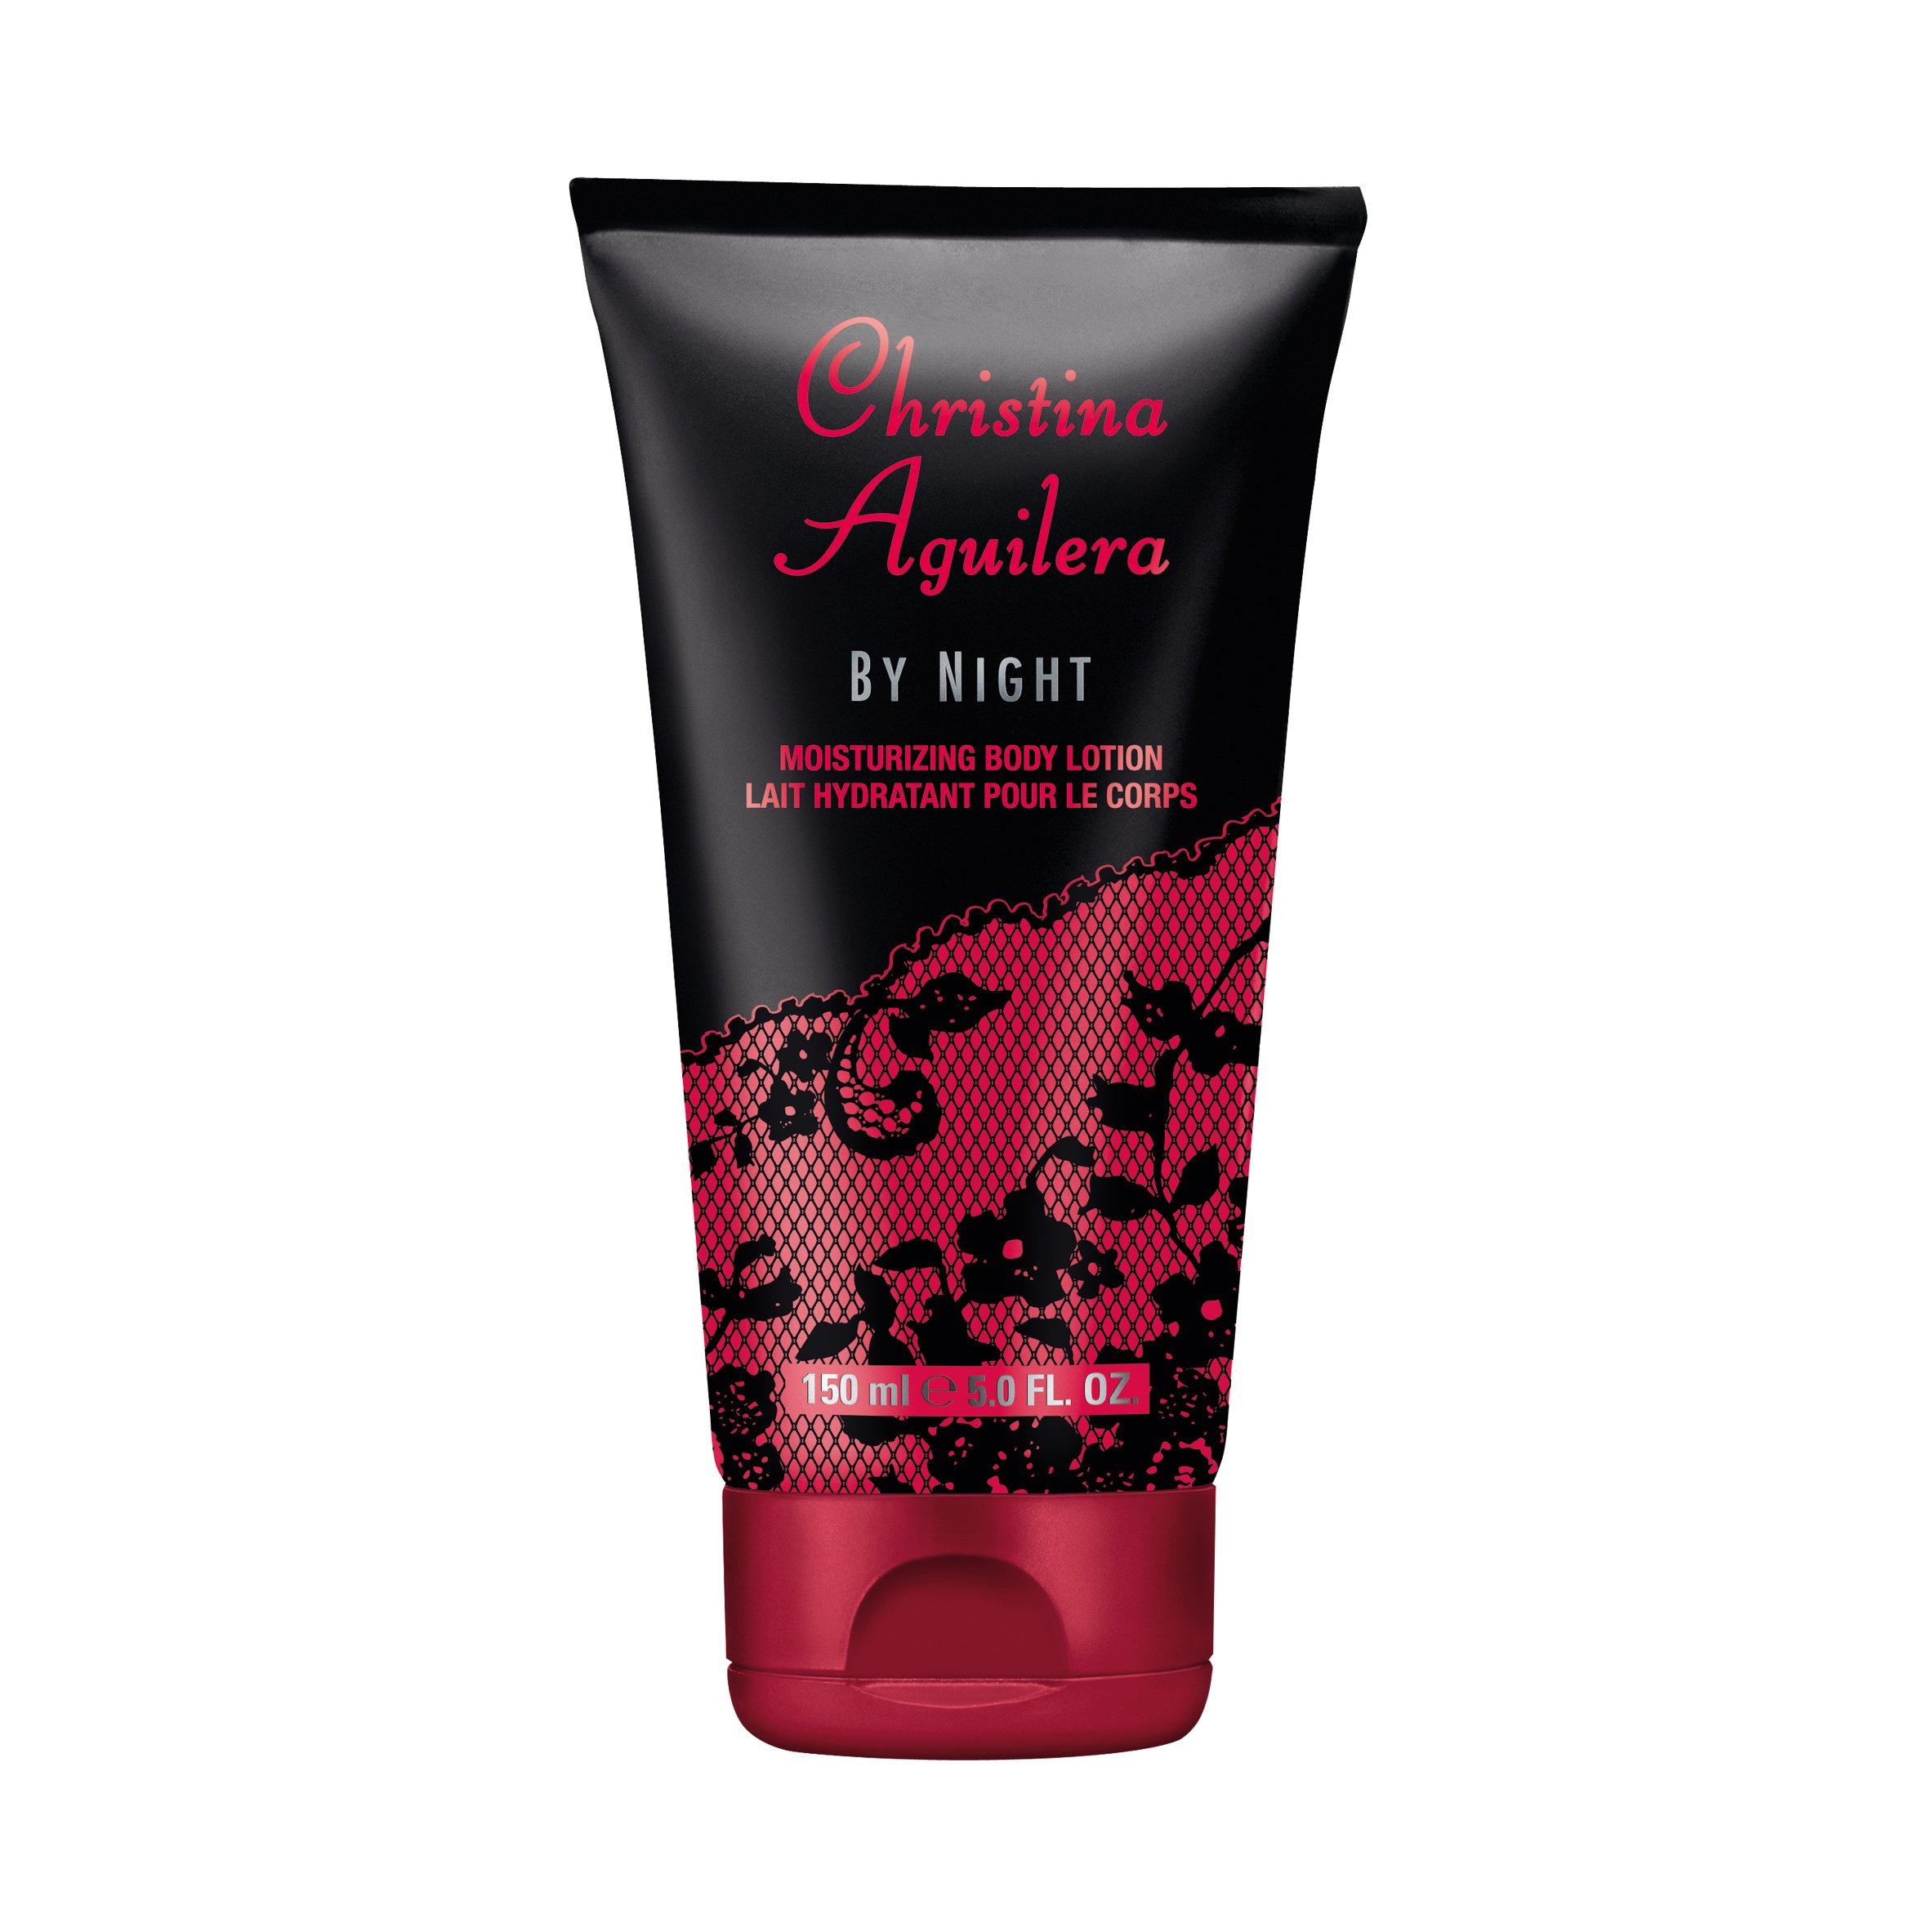 Christina Aguilera By Night Body Lotion 150 ml